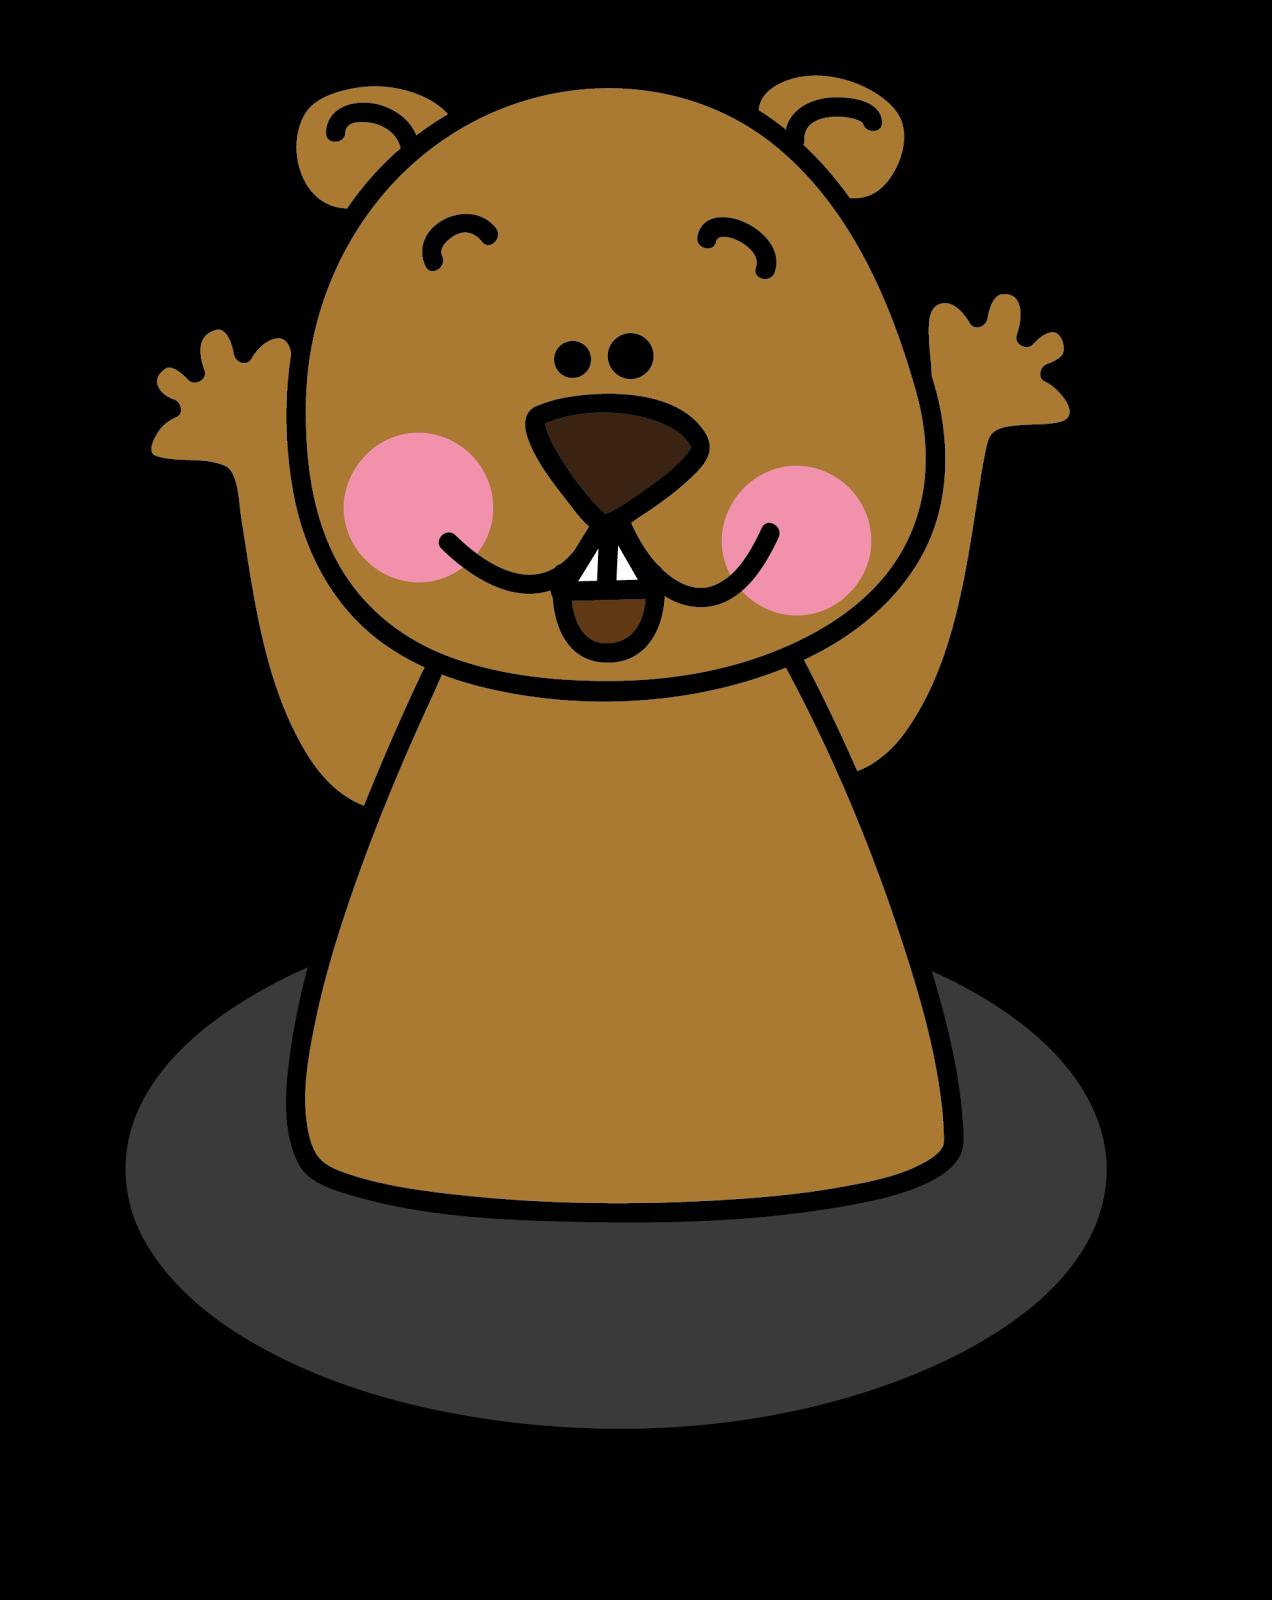 clip art transparent Groundhog clipart. Free cliparts download clip.